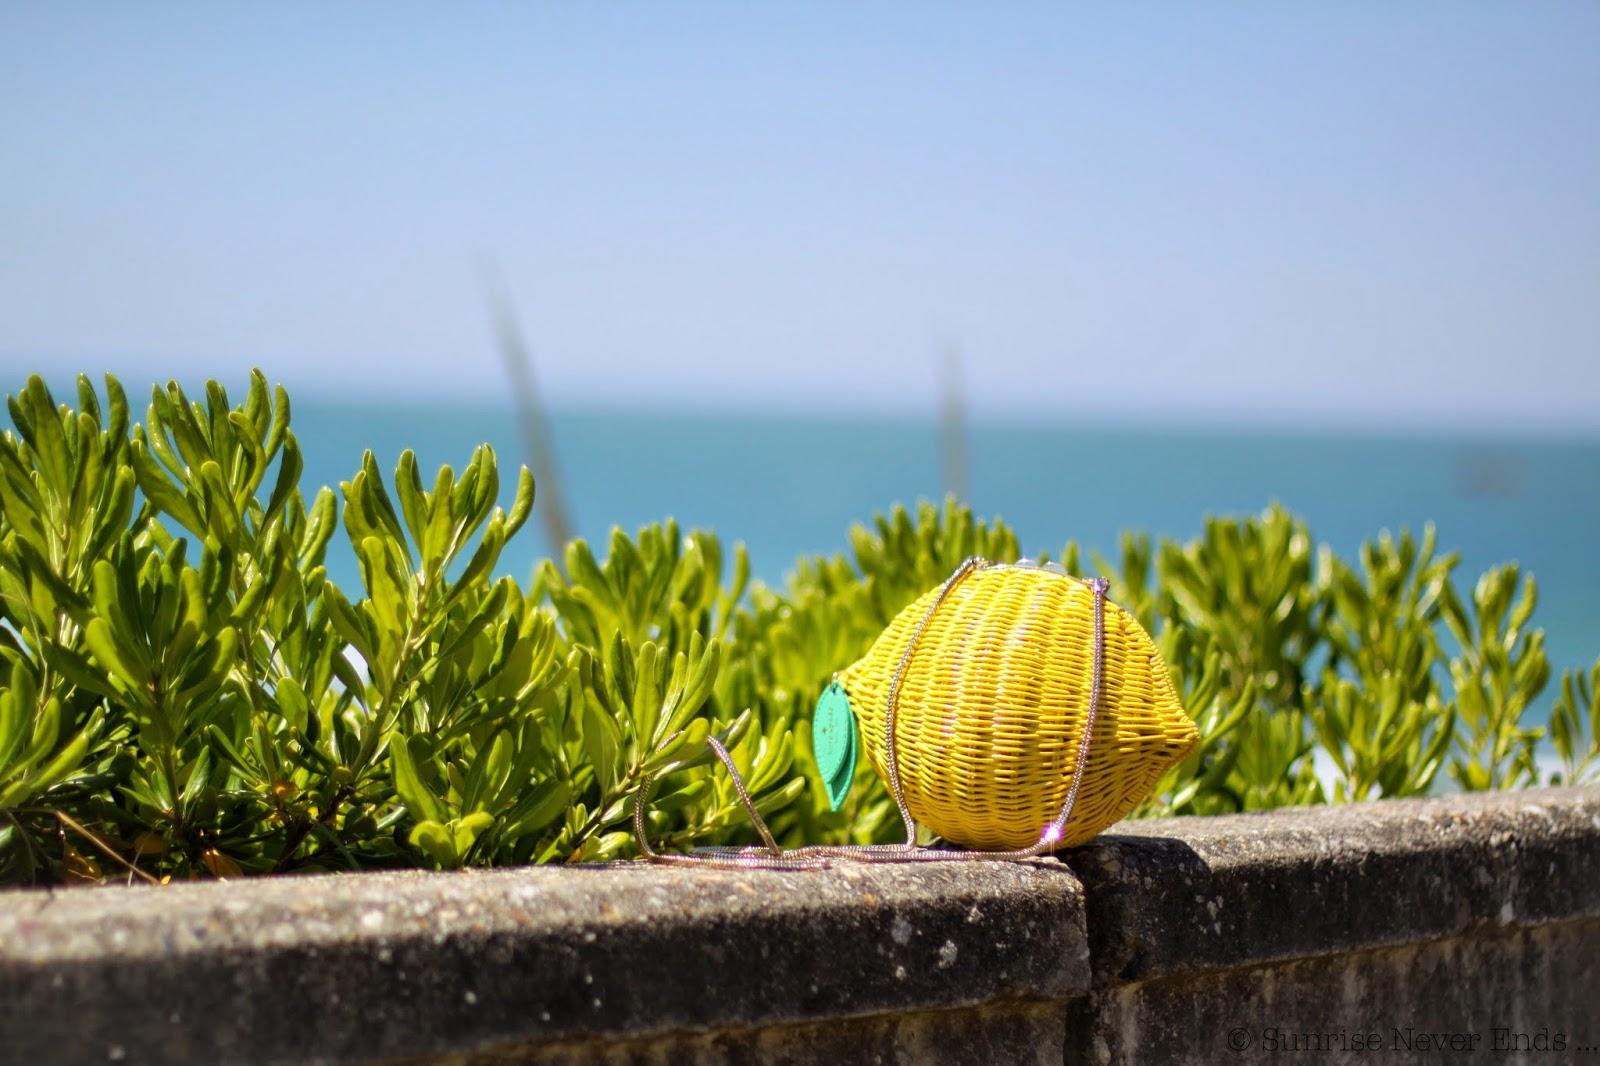 citron,limonade,citronnade,capri,sac,osier,kate spade,biarritz,lemons,limone,limoncello